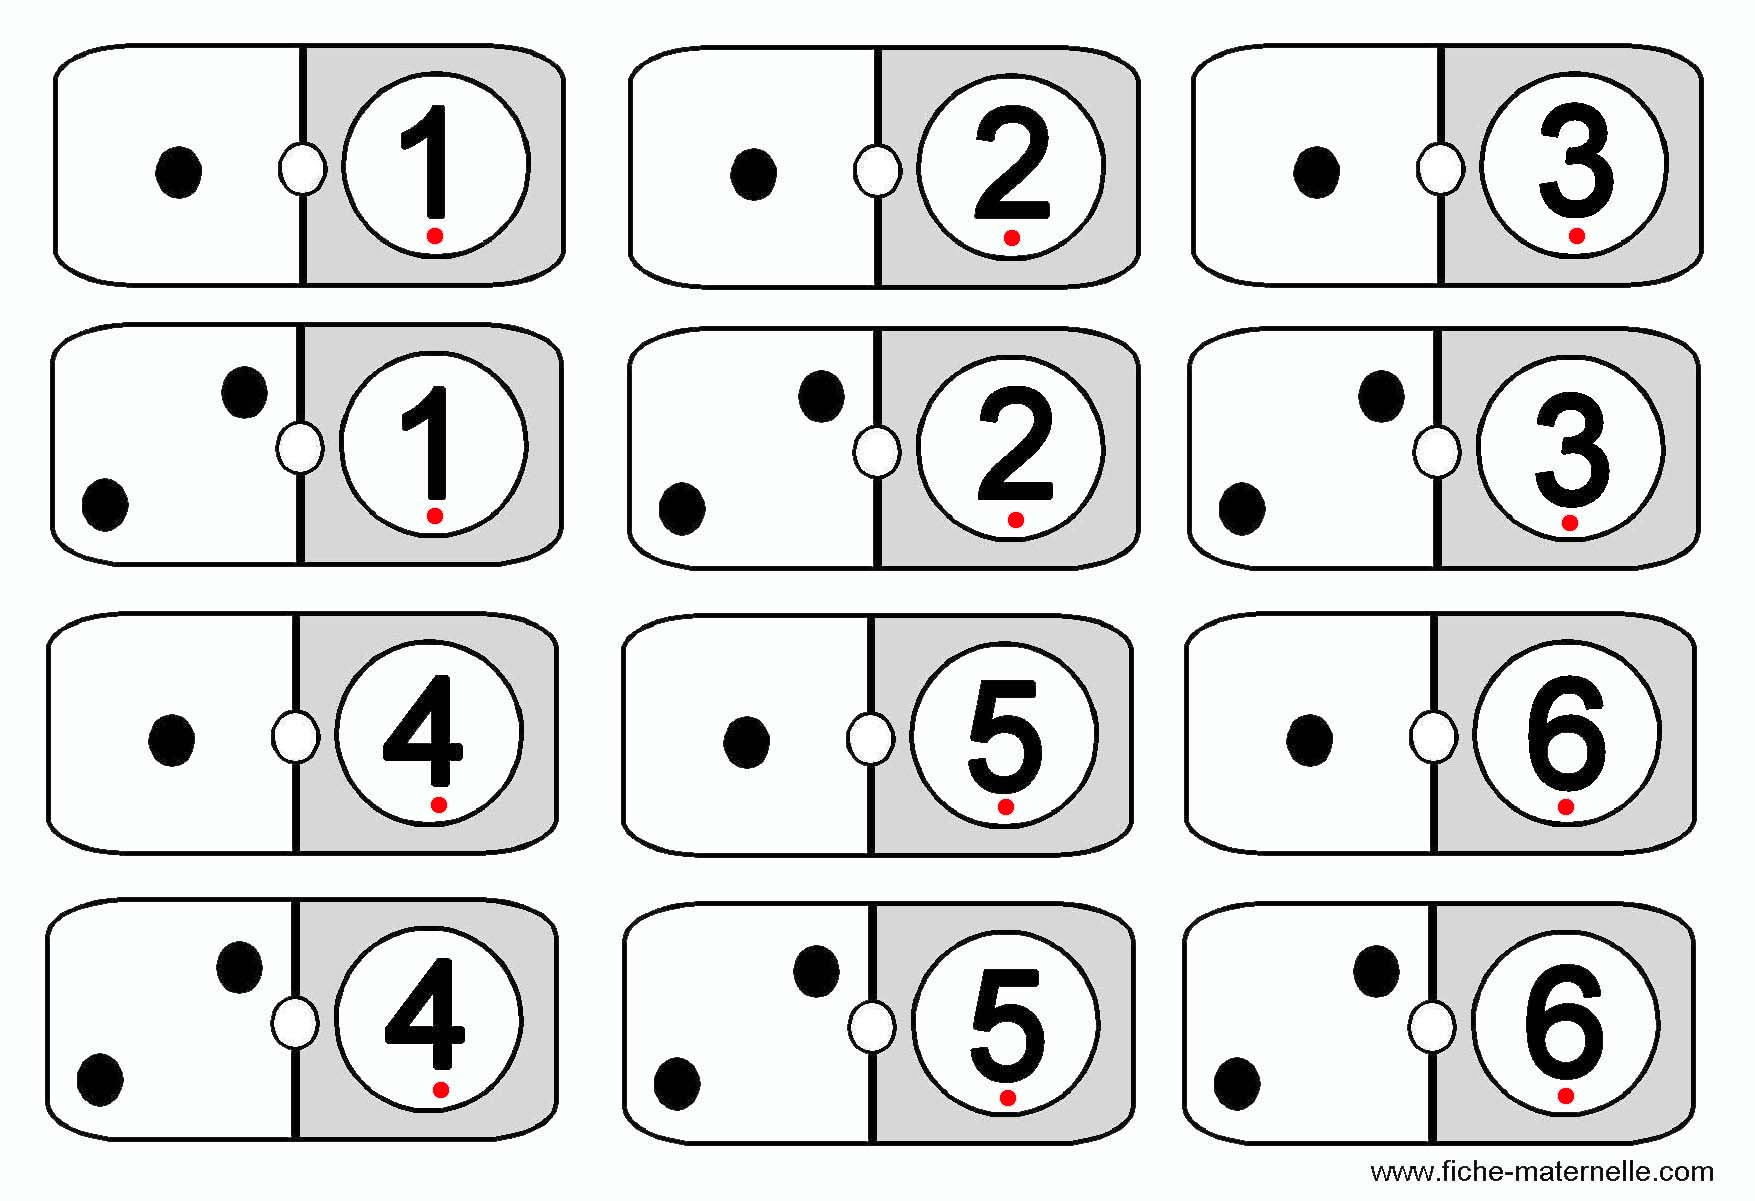 jeux math matiques pour apprendre compter en maternelle. Black Bedroom Furniture Sets. Home Design Ideas